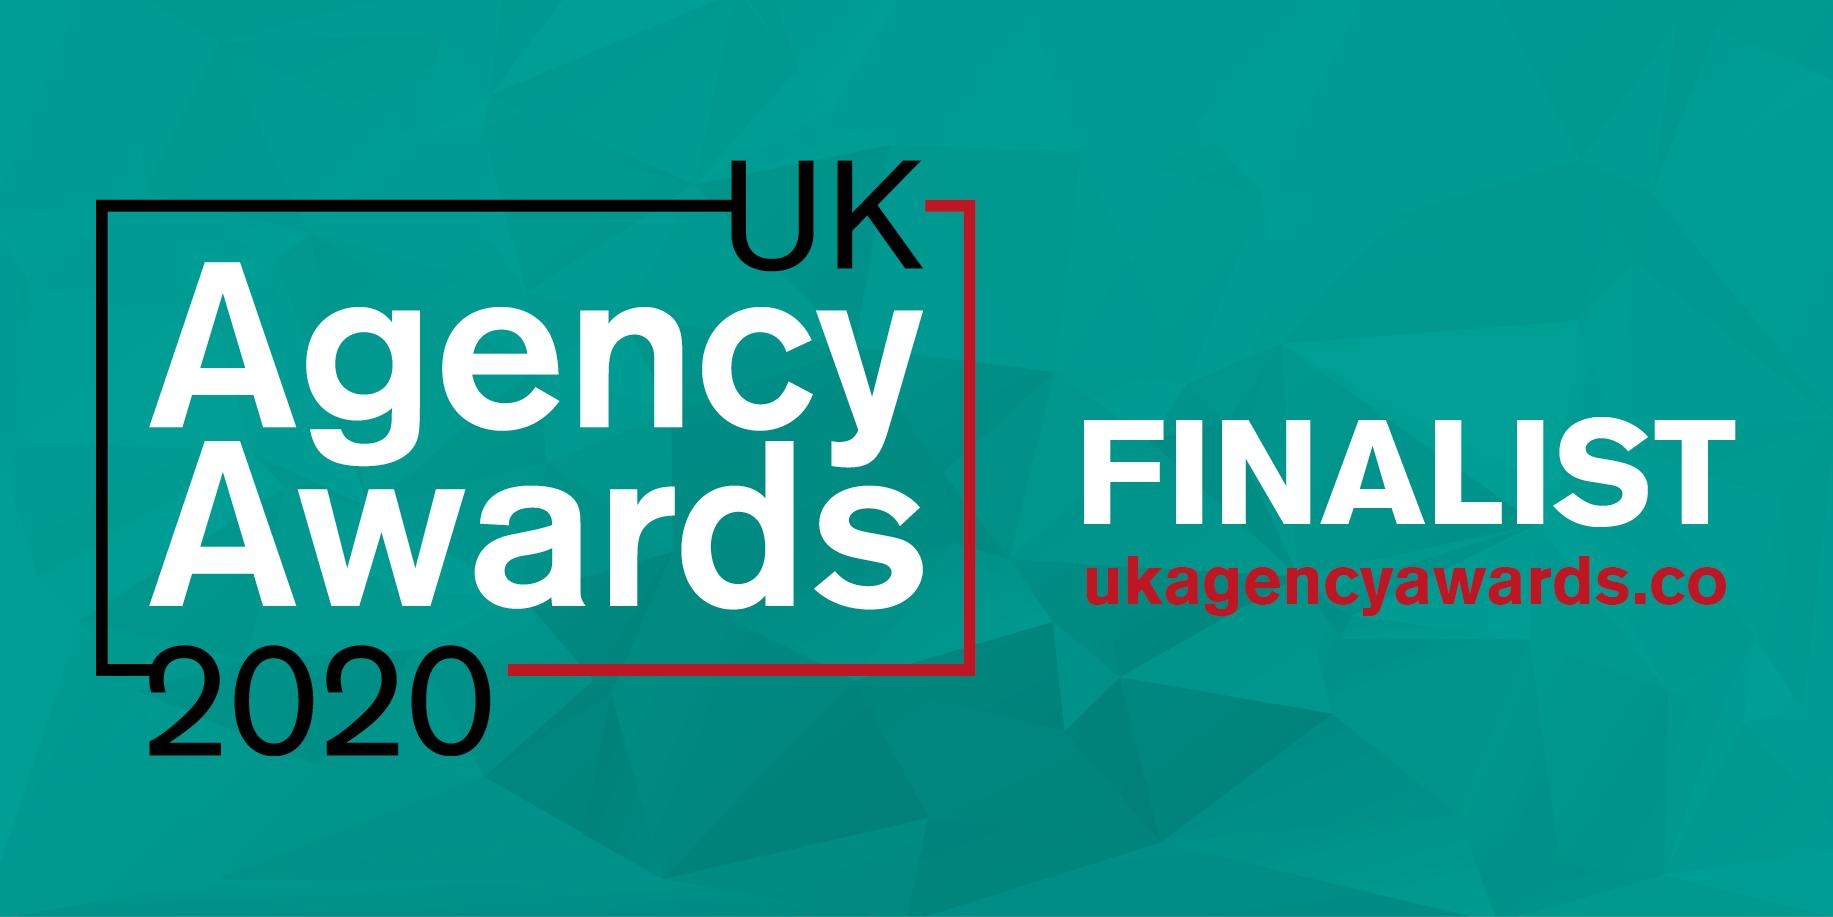 UK Agency Awards: Shortlisted for TWO Awards